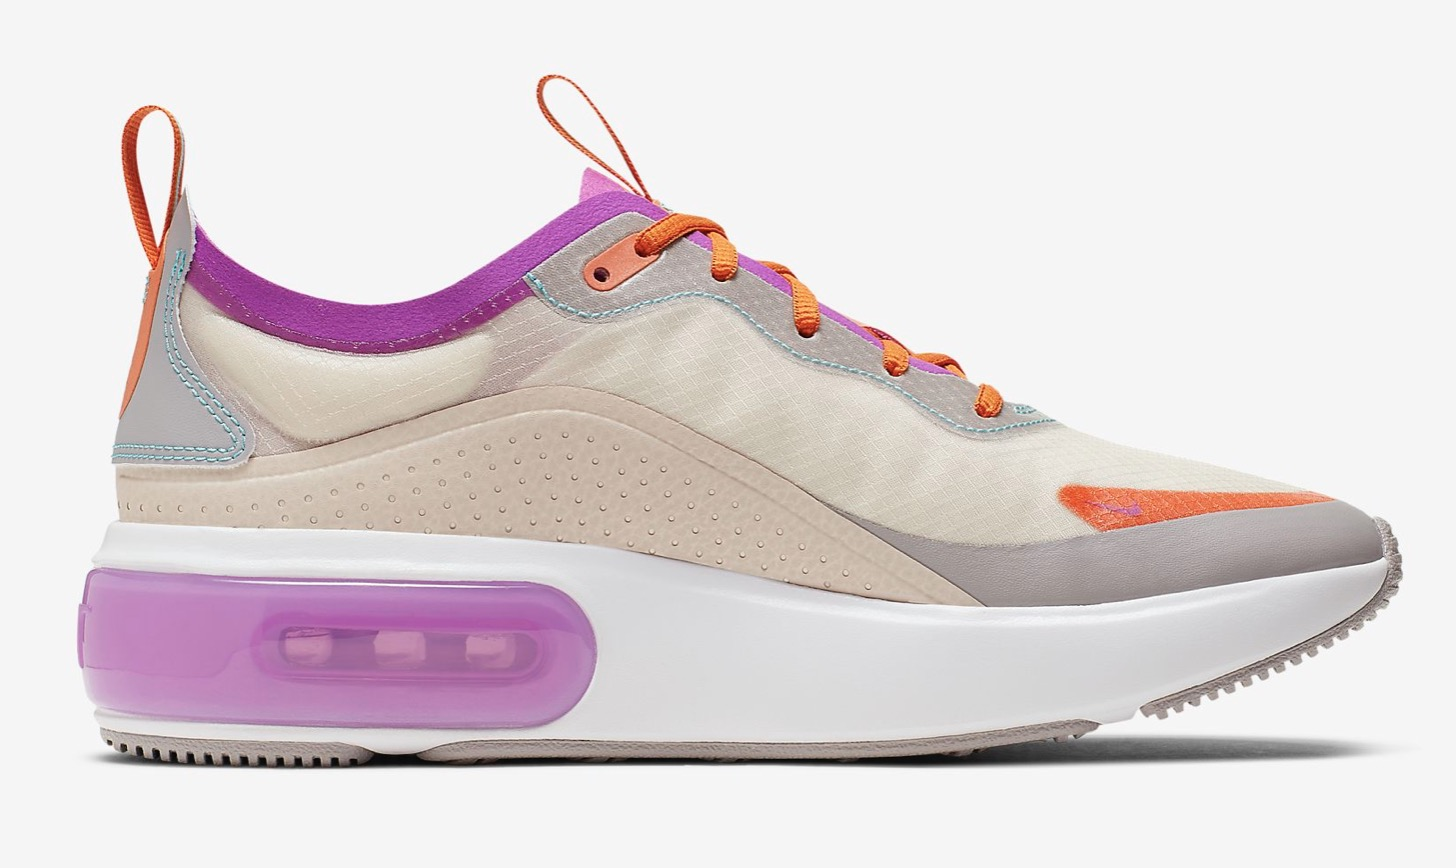 Nike Air Max DiaLight Orewood Brown/Starfish/Atmosphere Grey/Hyper Violet inner wall